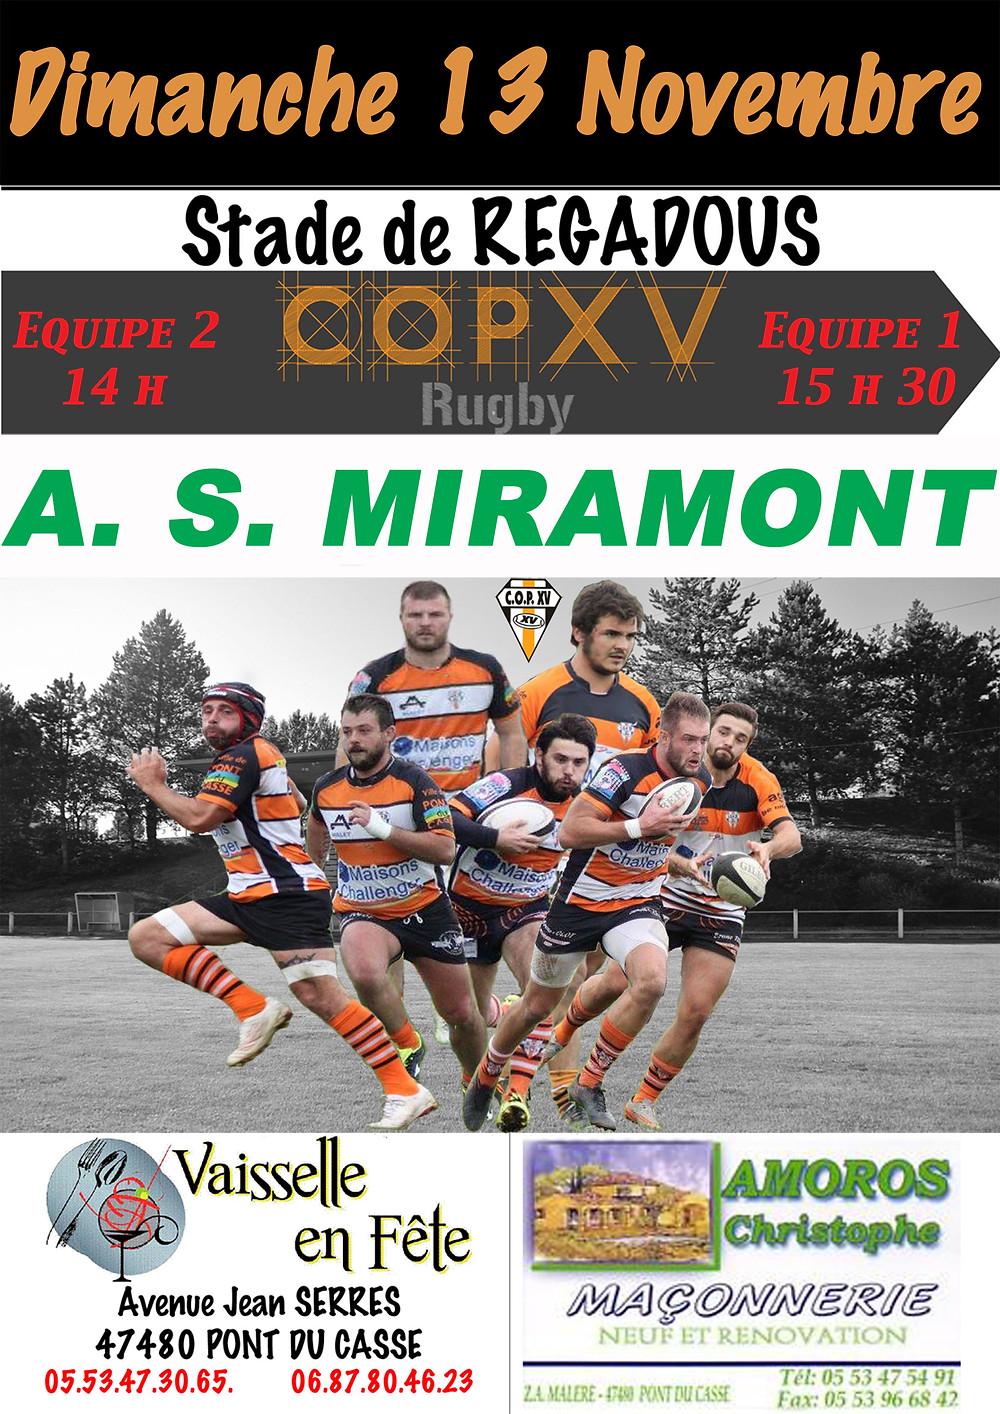 L'affiche  COPXV - A.S. MIRAMONT